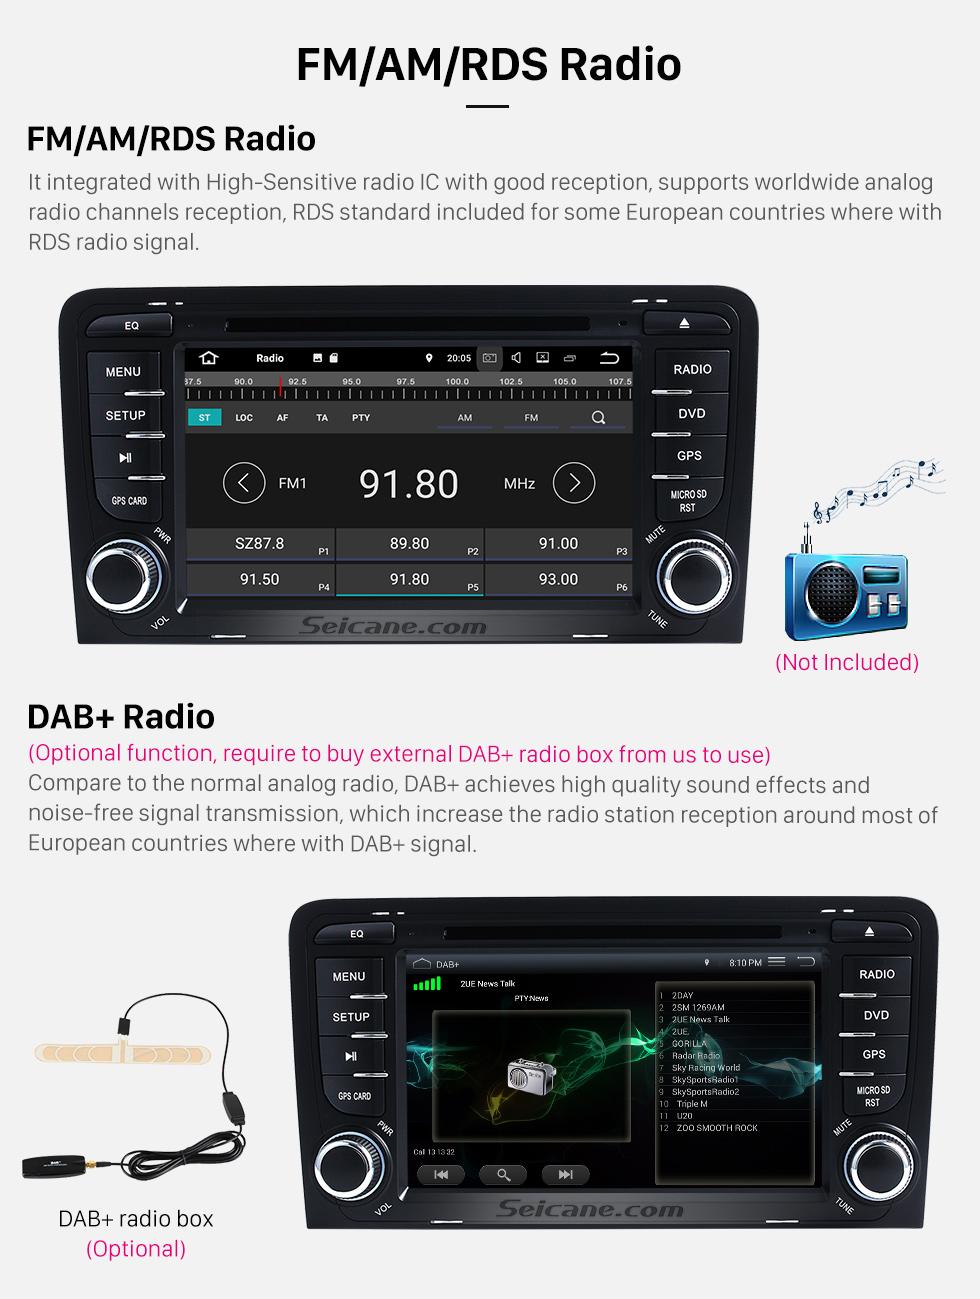 Seicane Seicane S127683 16G 2003-2011 Audi A3 Android 7.1.1 Автомобиль Радио навигация Aftermarket стерео с Четырехъядерные процессоры CPU AM FM Radio Зеркало Ссылка OBD2 3G WiFi Bluetooth DVD HD 1024*600 Мульти-сенсорный экран Auto A/V HD 1080P видео